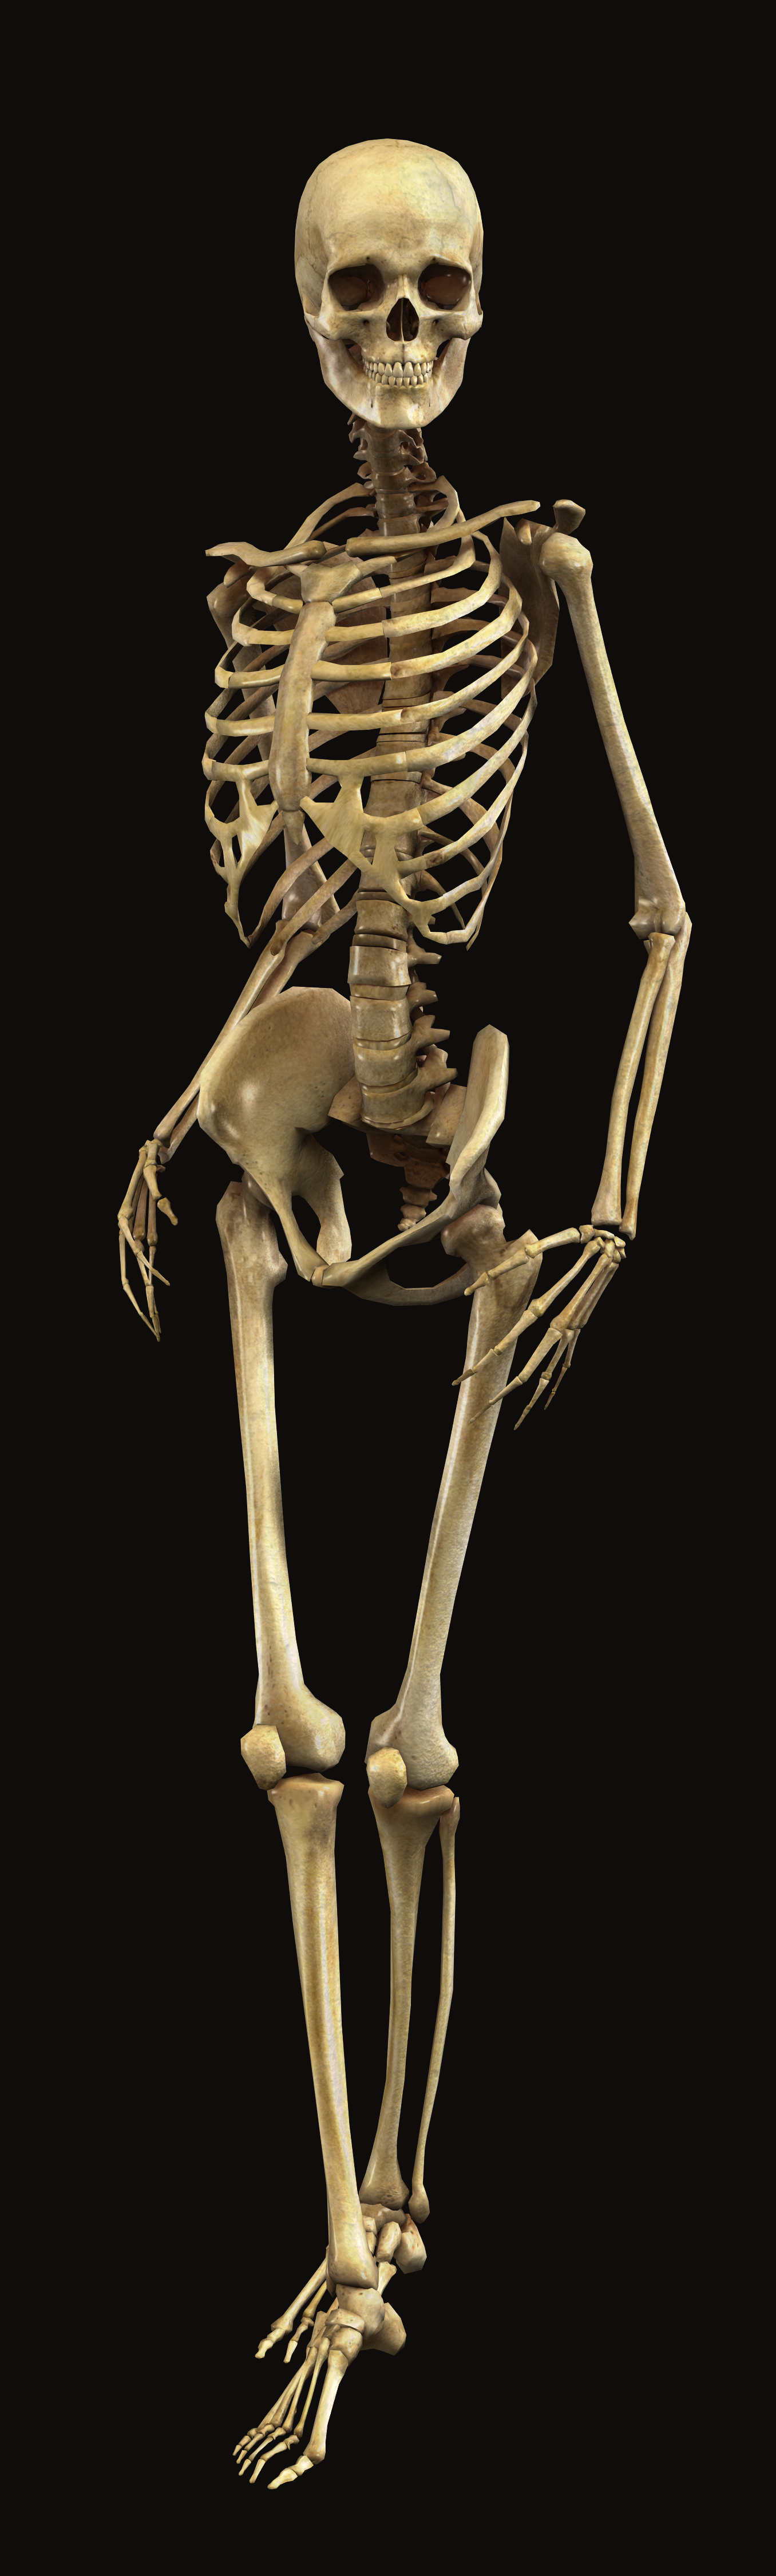 Category Skeletons